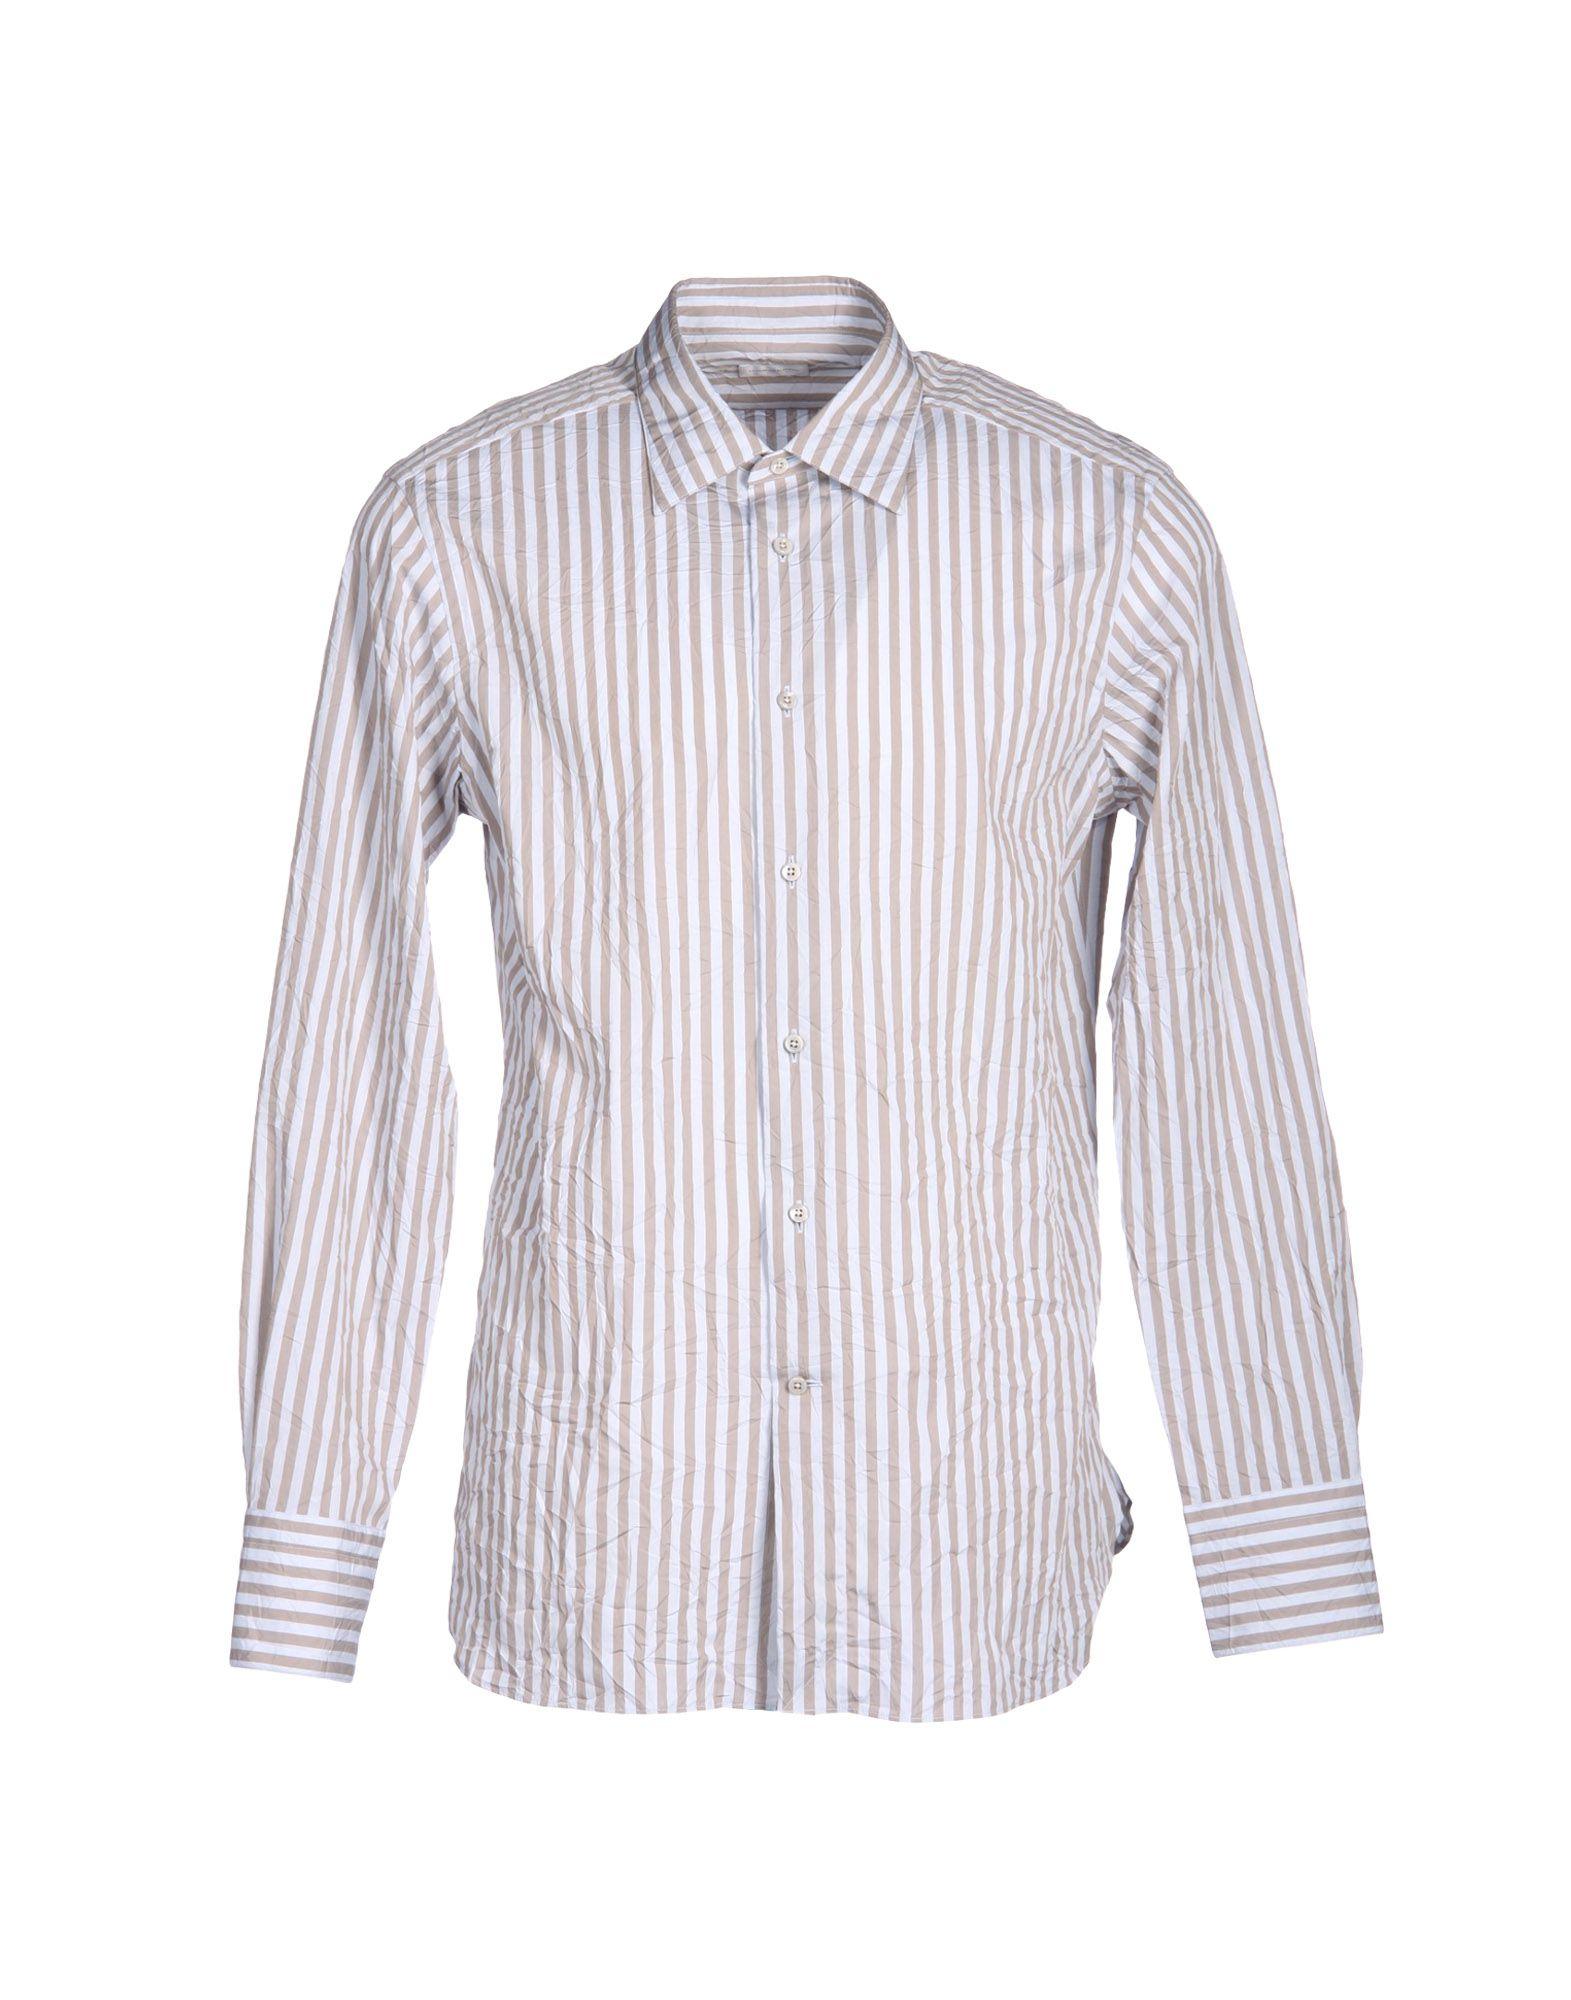 ermenegildo zegna shirt in gray for men dove grey lyst. Black Bedroom Furniture Sets. Home Design Ideas